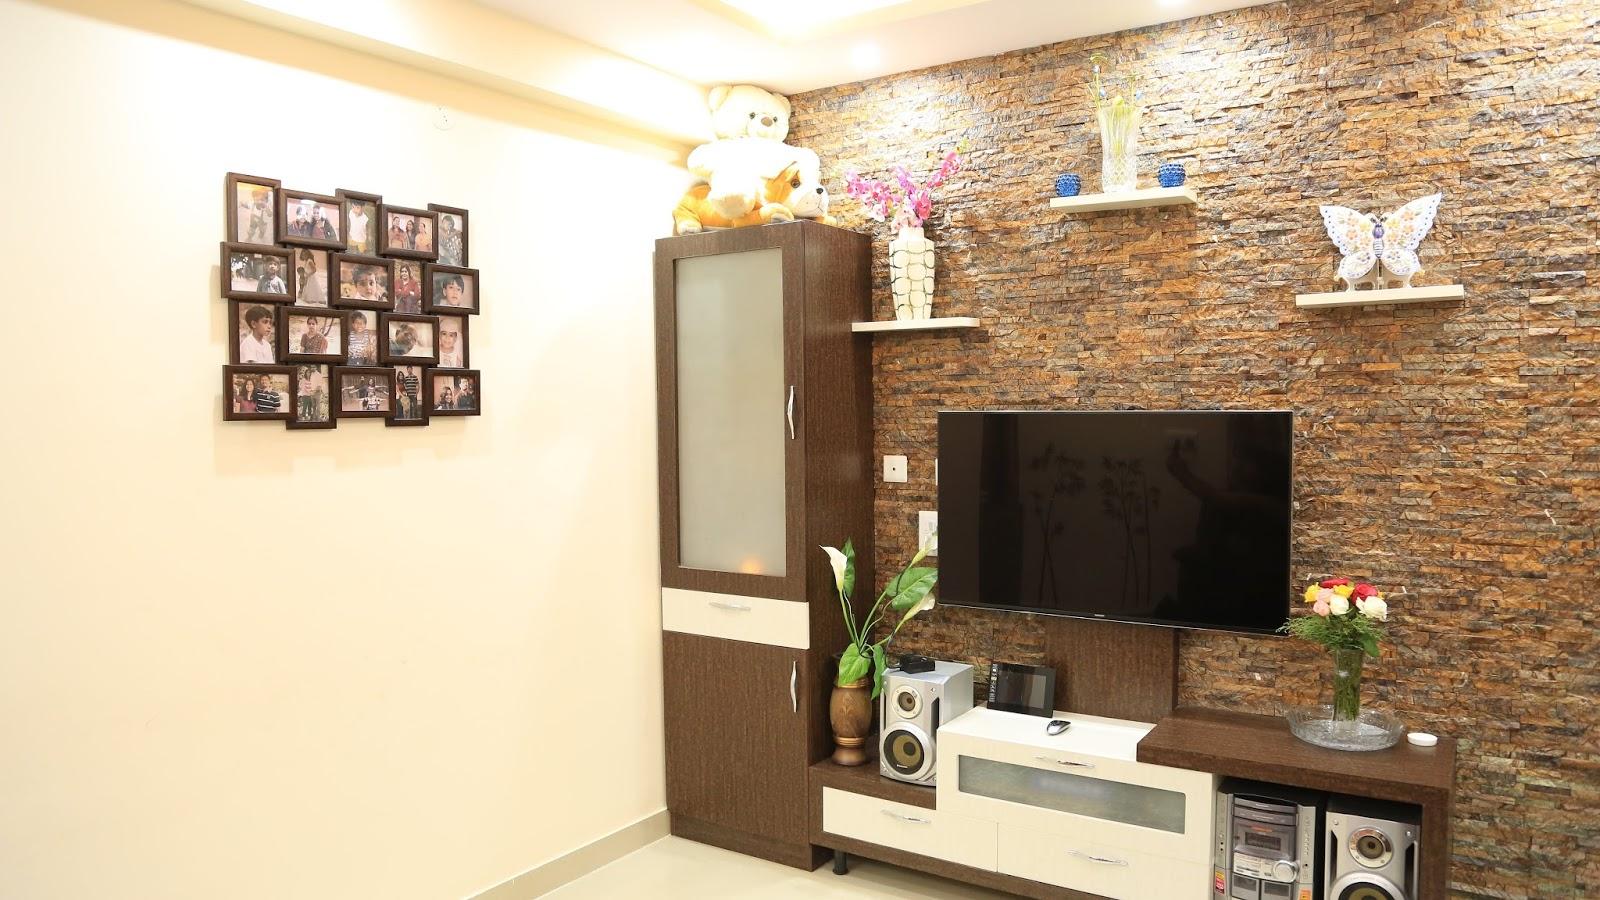 Koncept living interior concepts living room interior for Interior ideas for living rooms